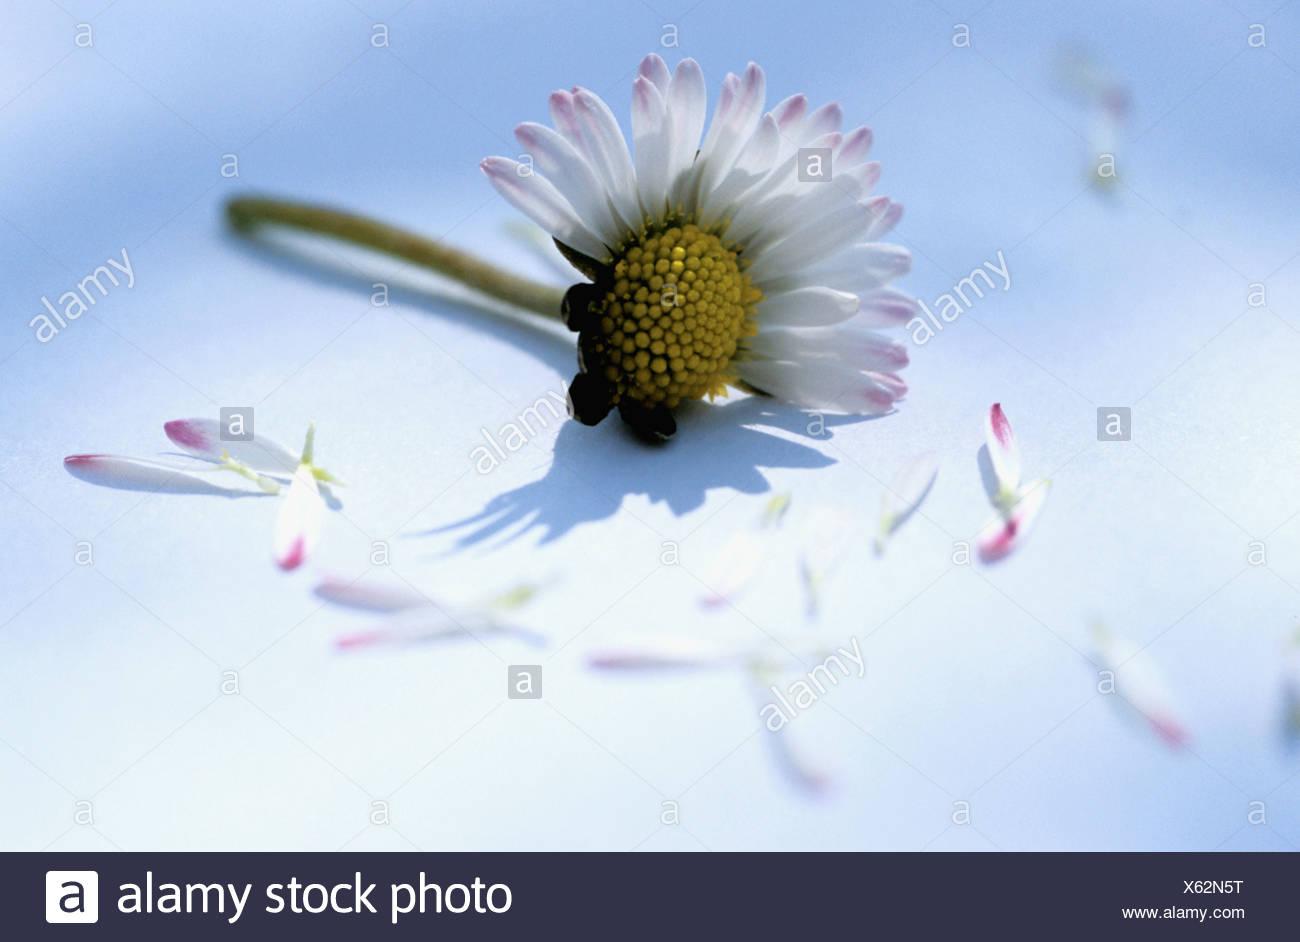 Plucked Petals Daisy Flower Stock Photos Plucked Petals Daisy